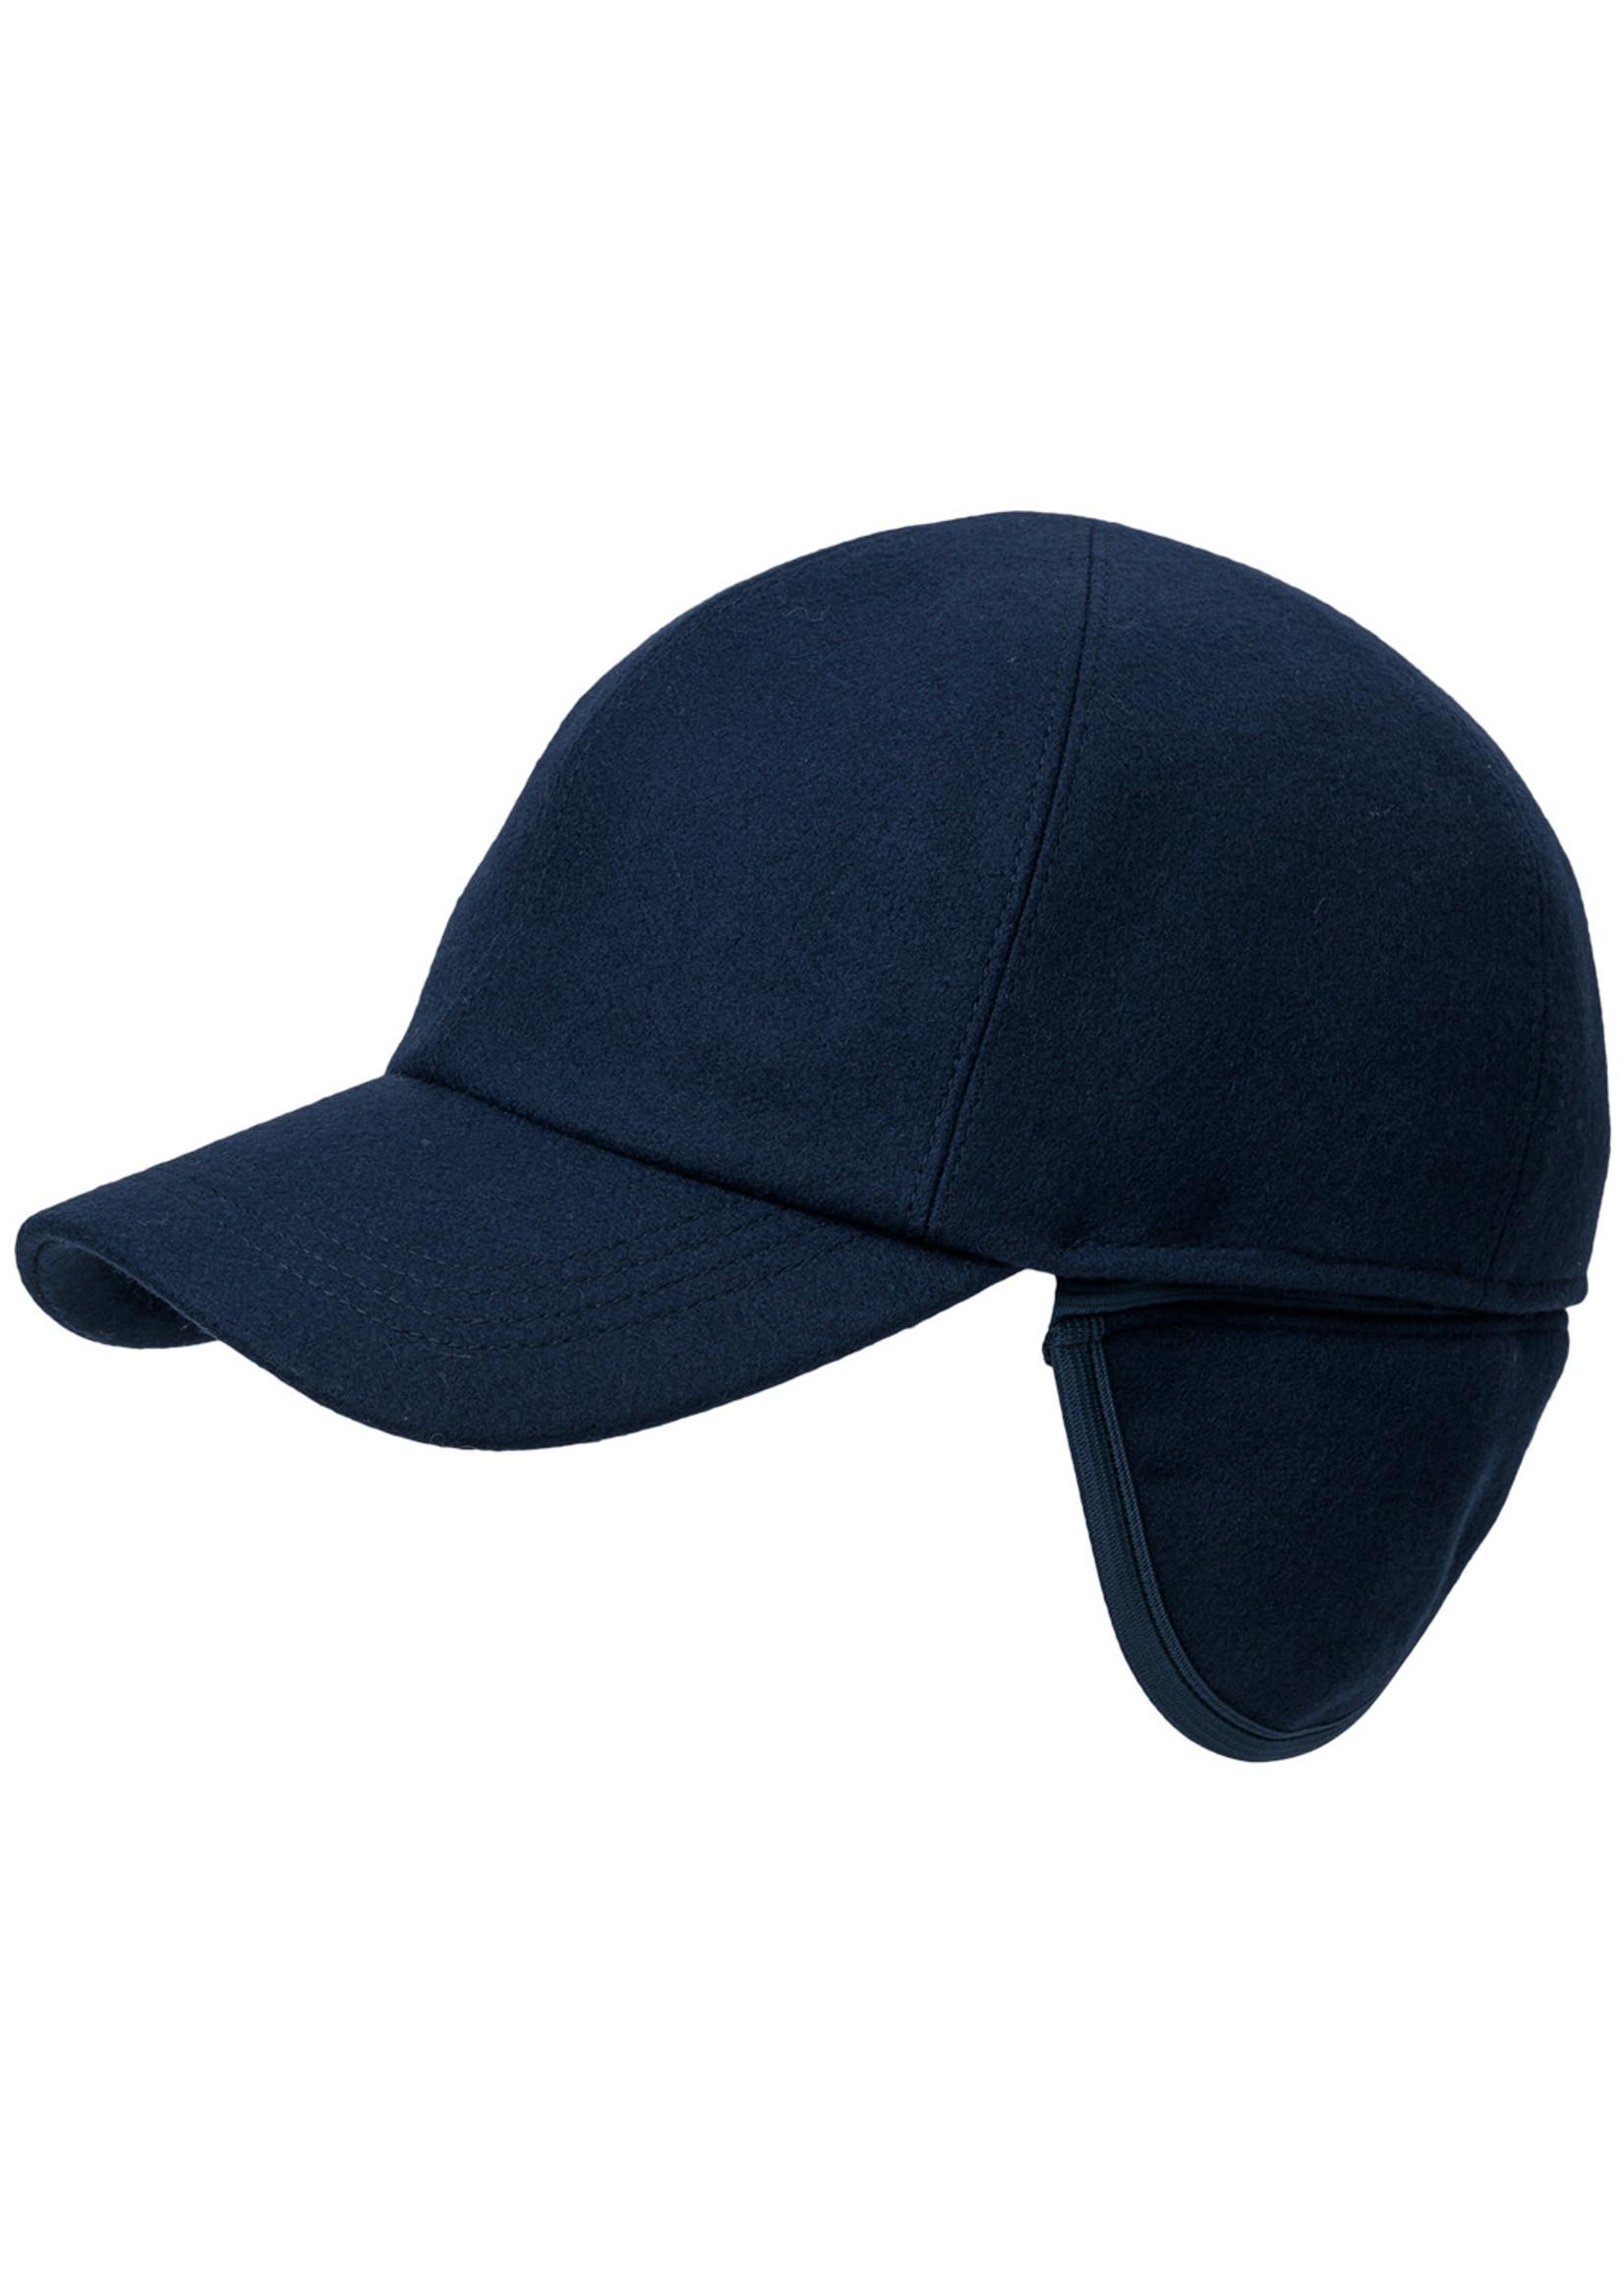 Wigens Kent Melton Wool Baseball Cap Navy